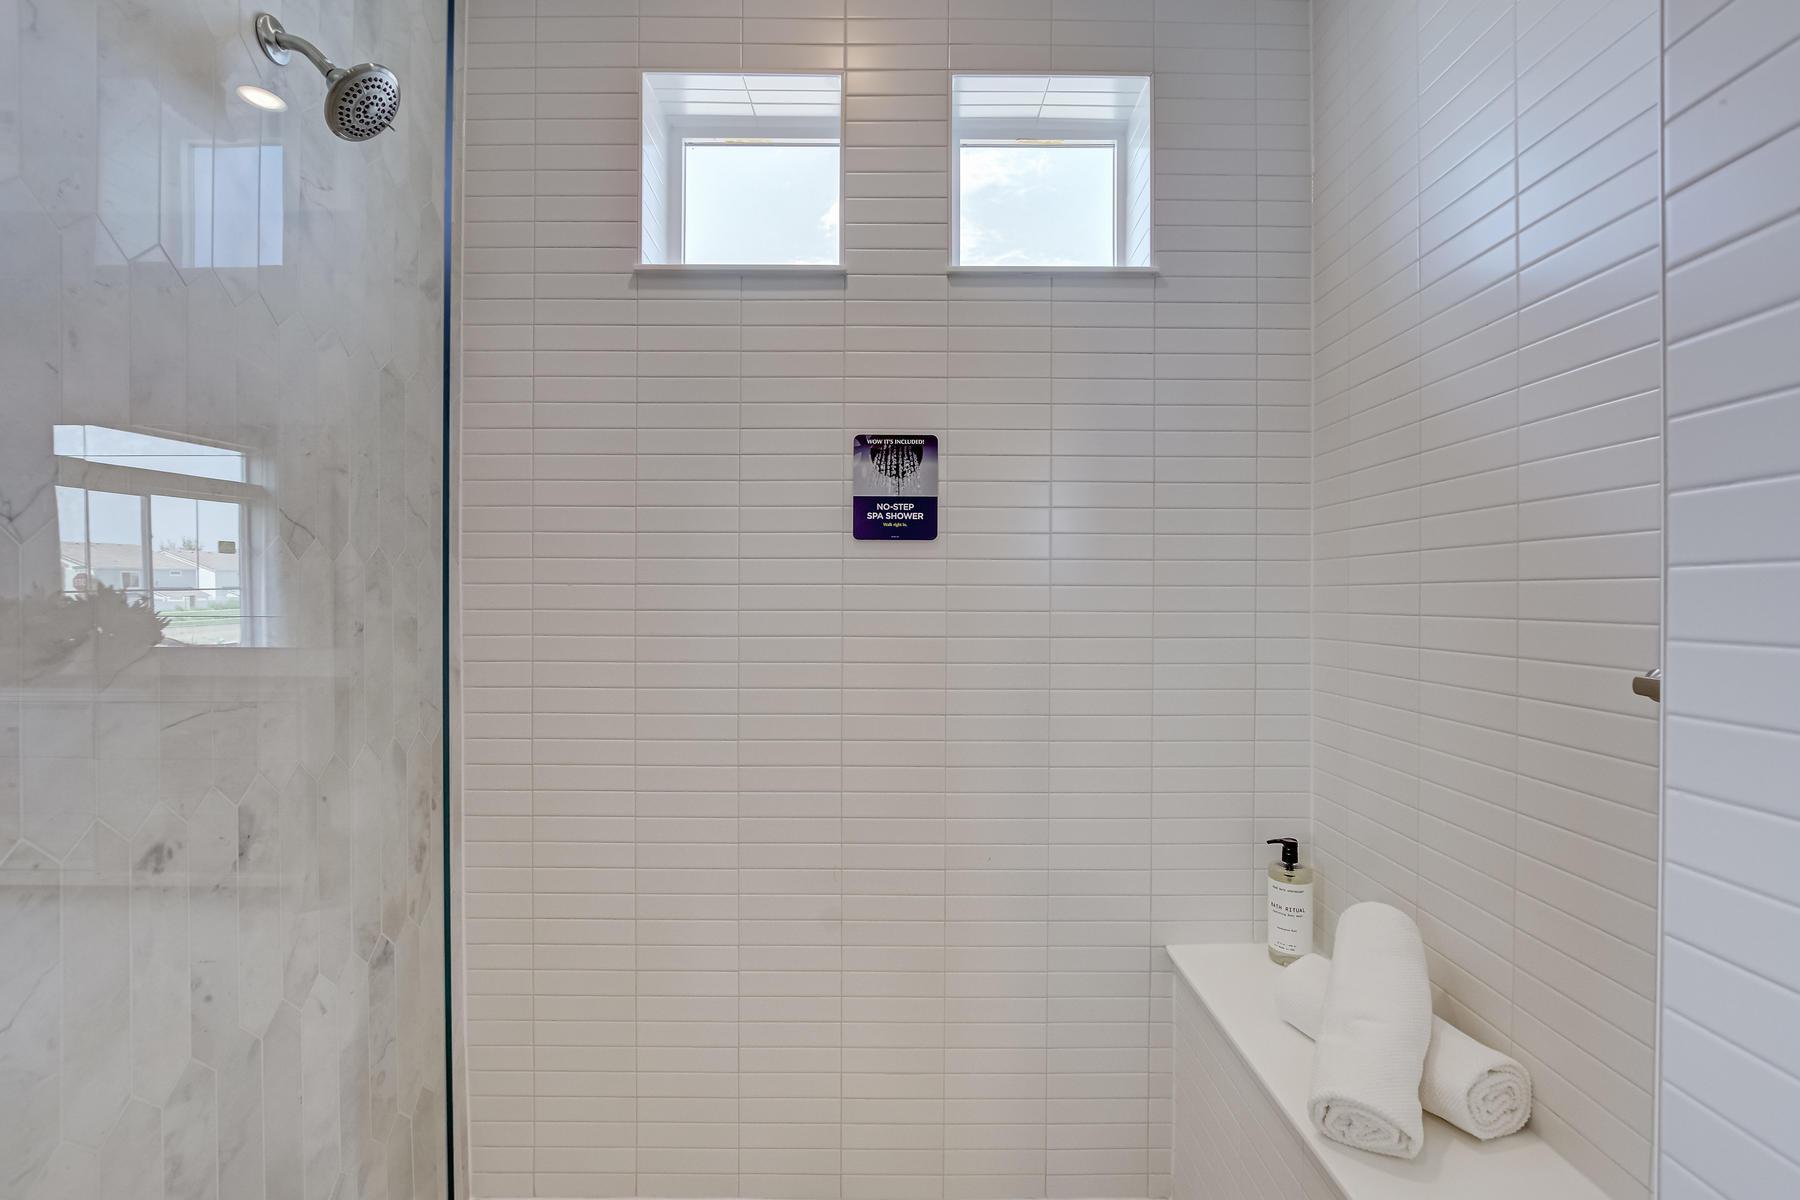 Bathroom featured in the Aspen By OakwoodLife in Denver, CO